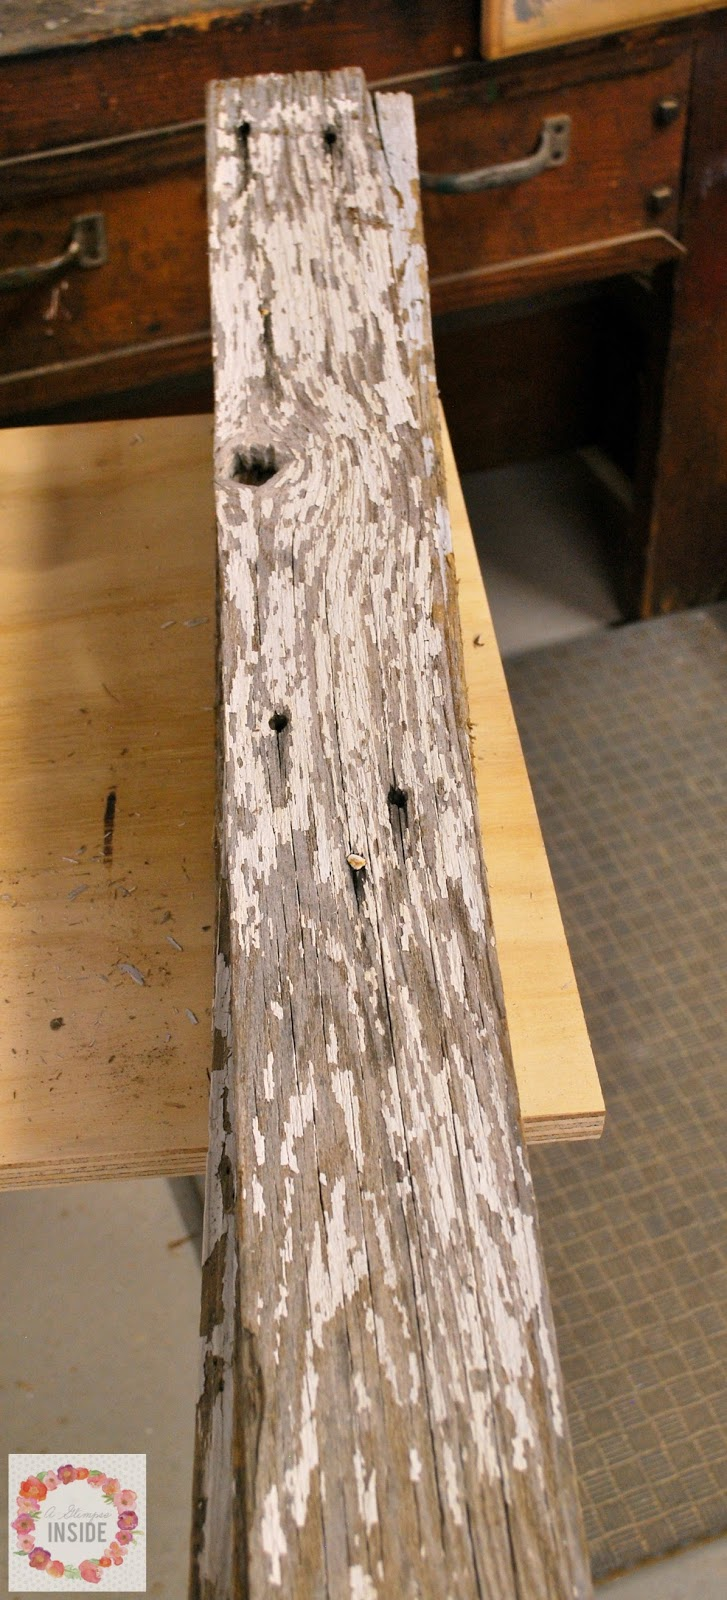 A Glimpse Inside Reclaimed Wood Trees